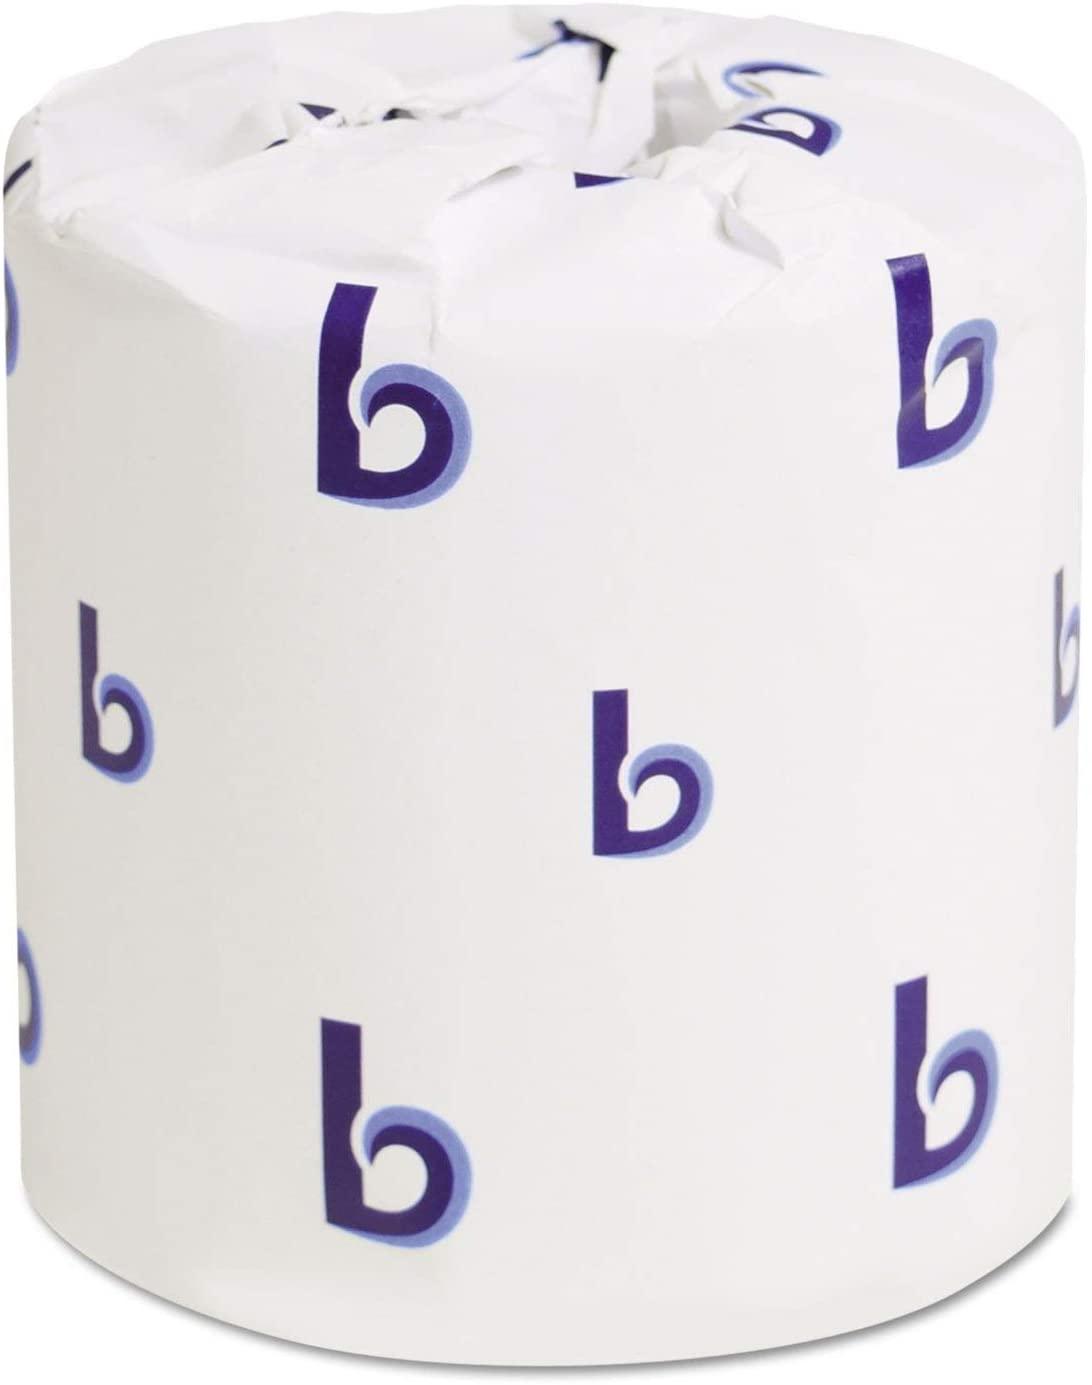 Boardwalk 6155 Two-Ply Toilet Tissue, White, 4 1/2 x 4 1/2 Sheet, 500 Sheets/Roll, 96 Rolls/CT